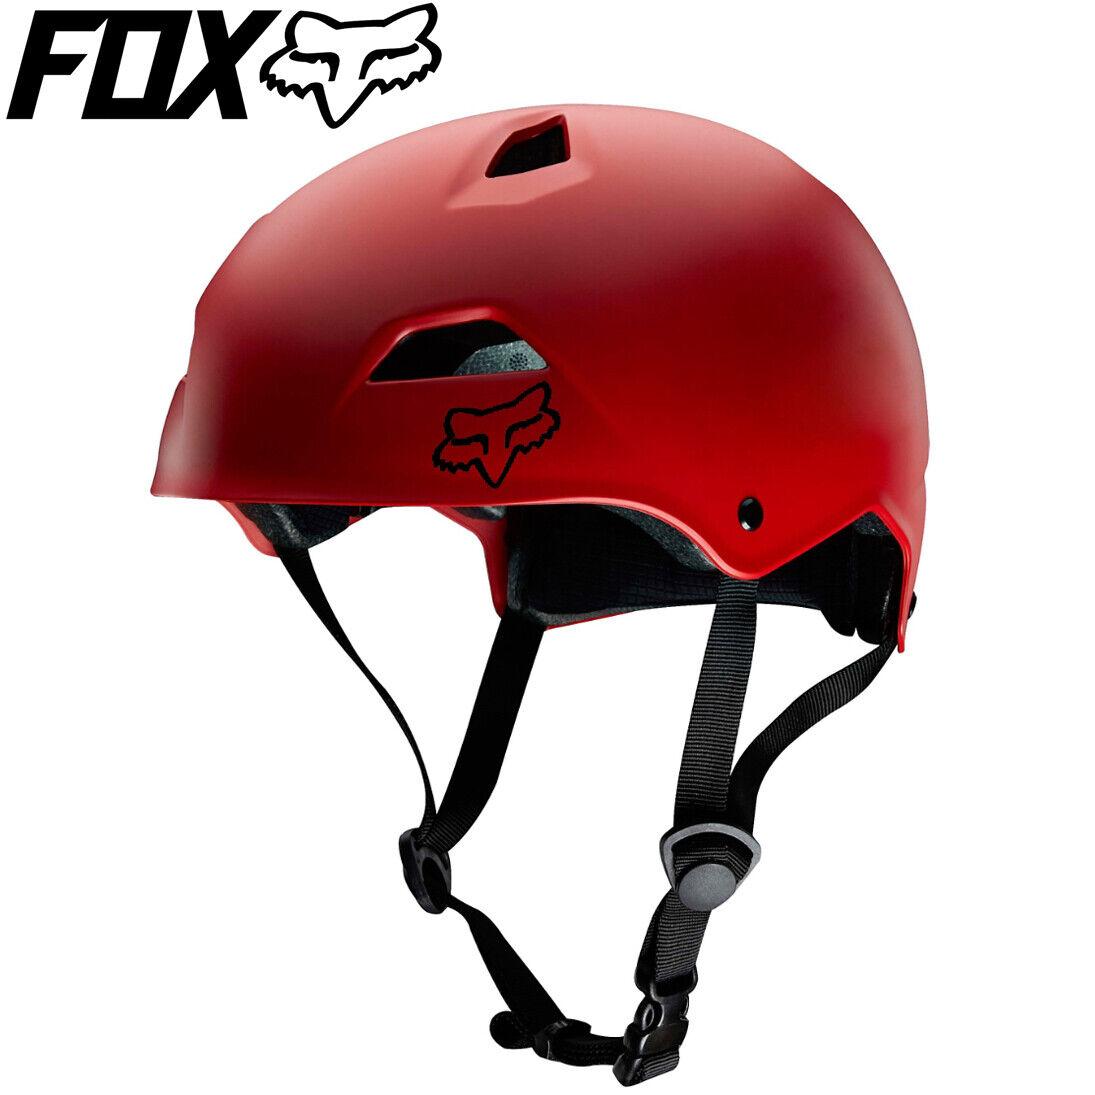 FOX Flight Sport Hardshell Bicycle Helmet - Matte Red